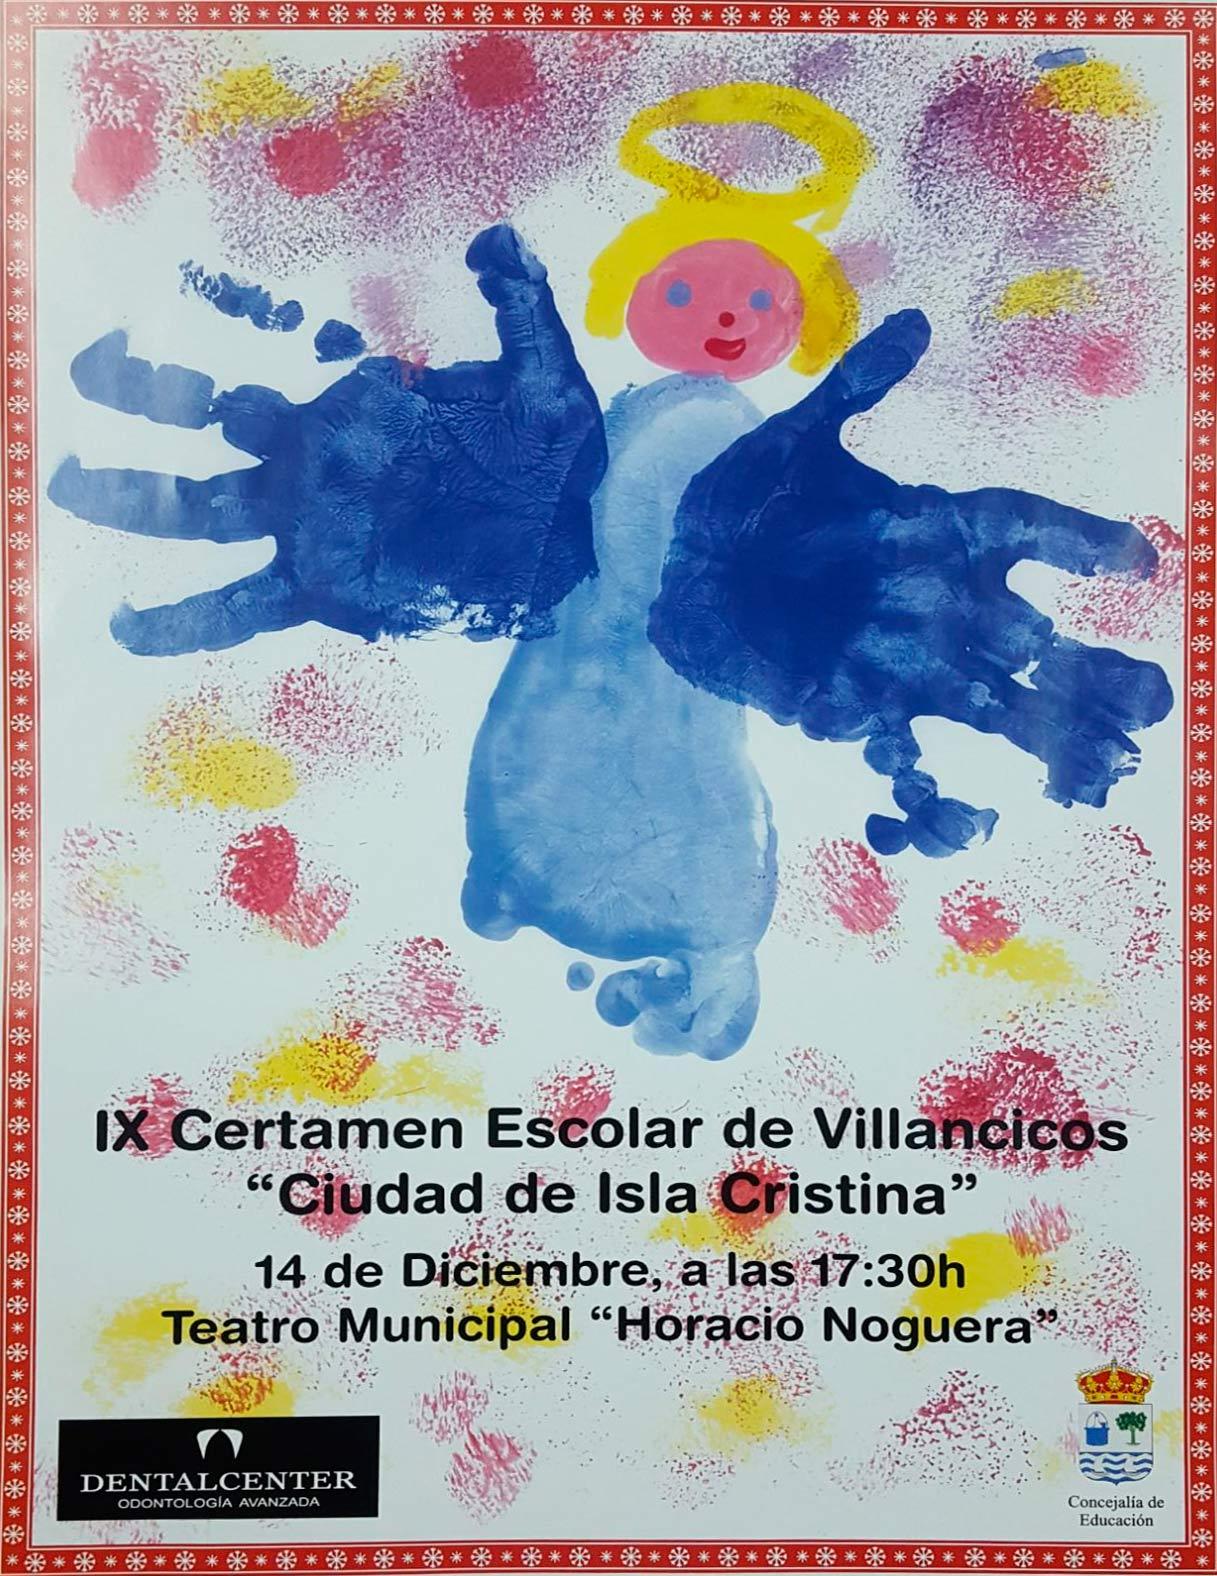 IX Certamen Escolar de Villancicos ciudad de Isla Cristina